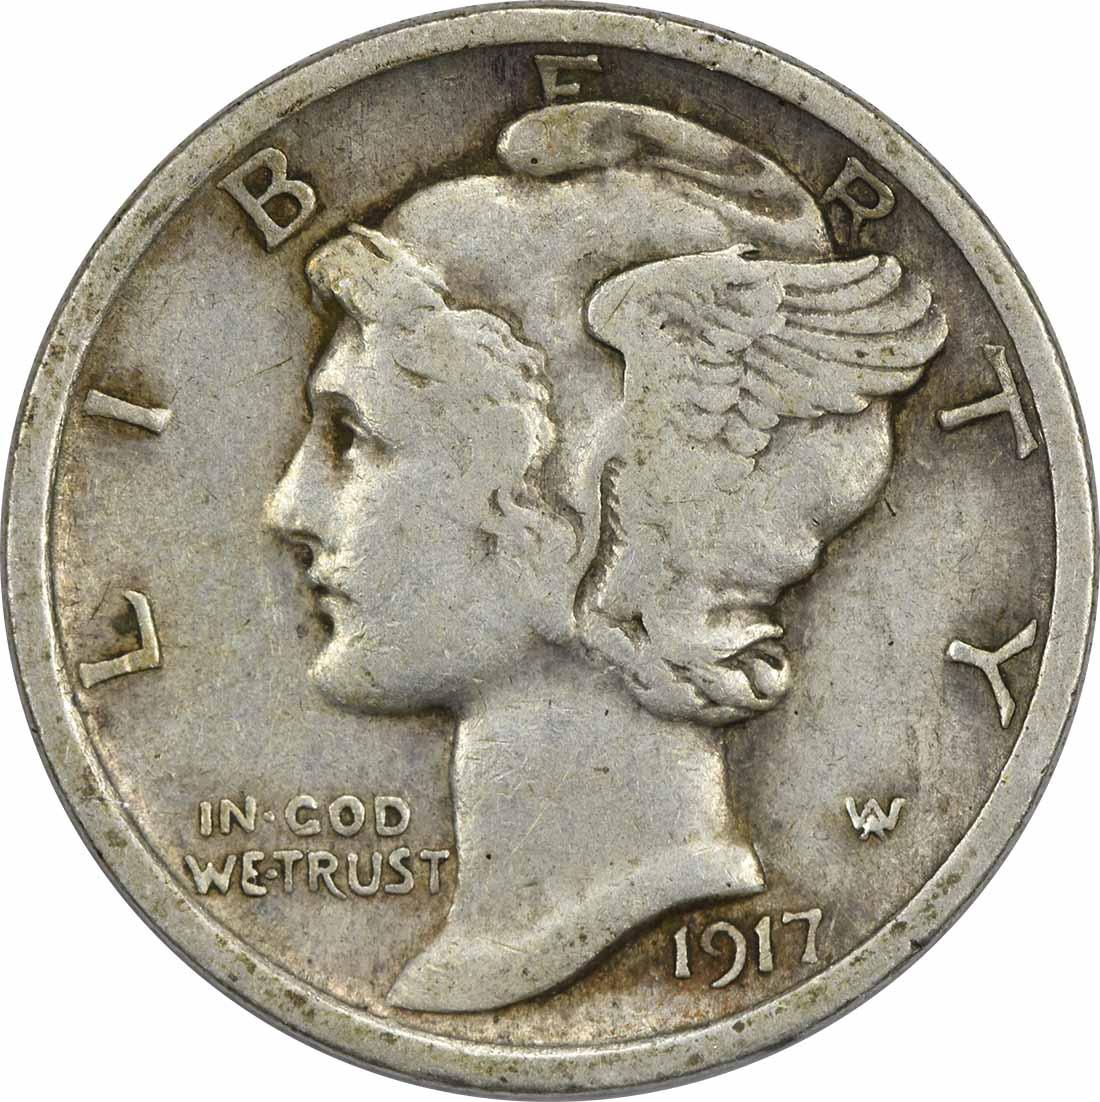 1917 Mercury Silver Dime EF Uncertified